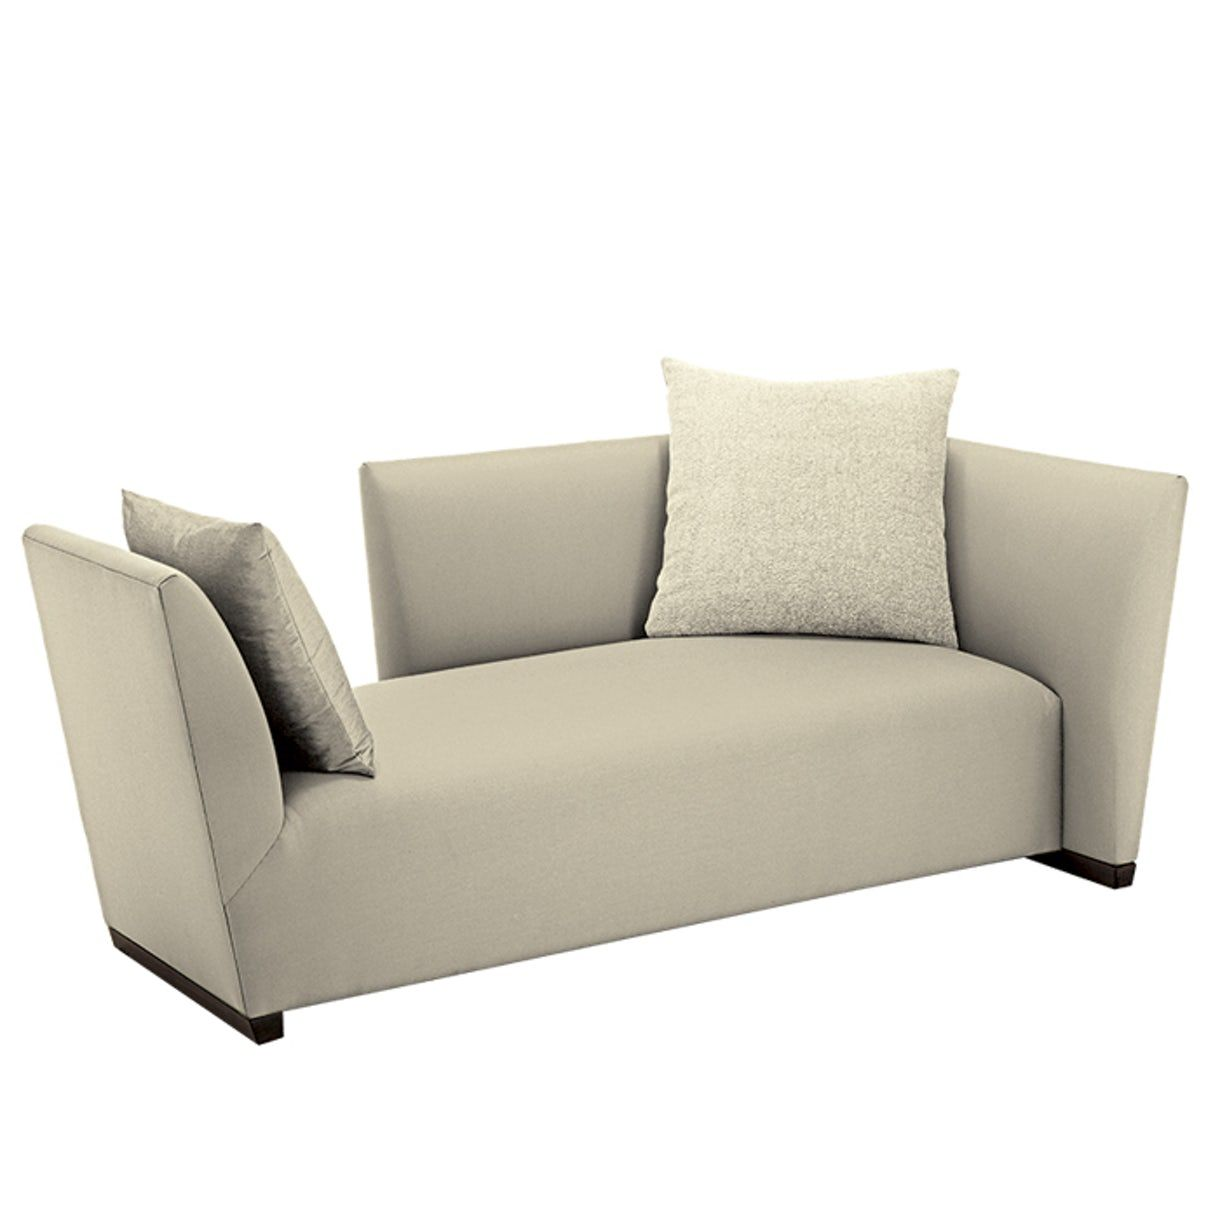 Island Sofa Petite Contemporary Metal Upholstery Fabric Sofas